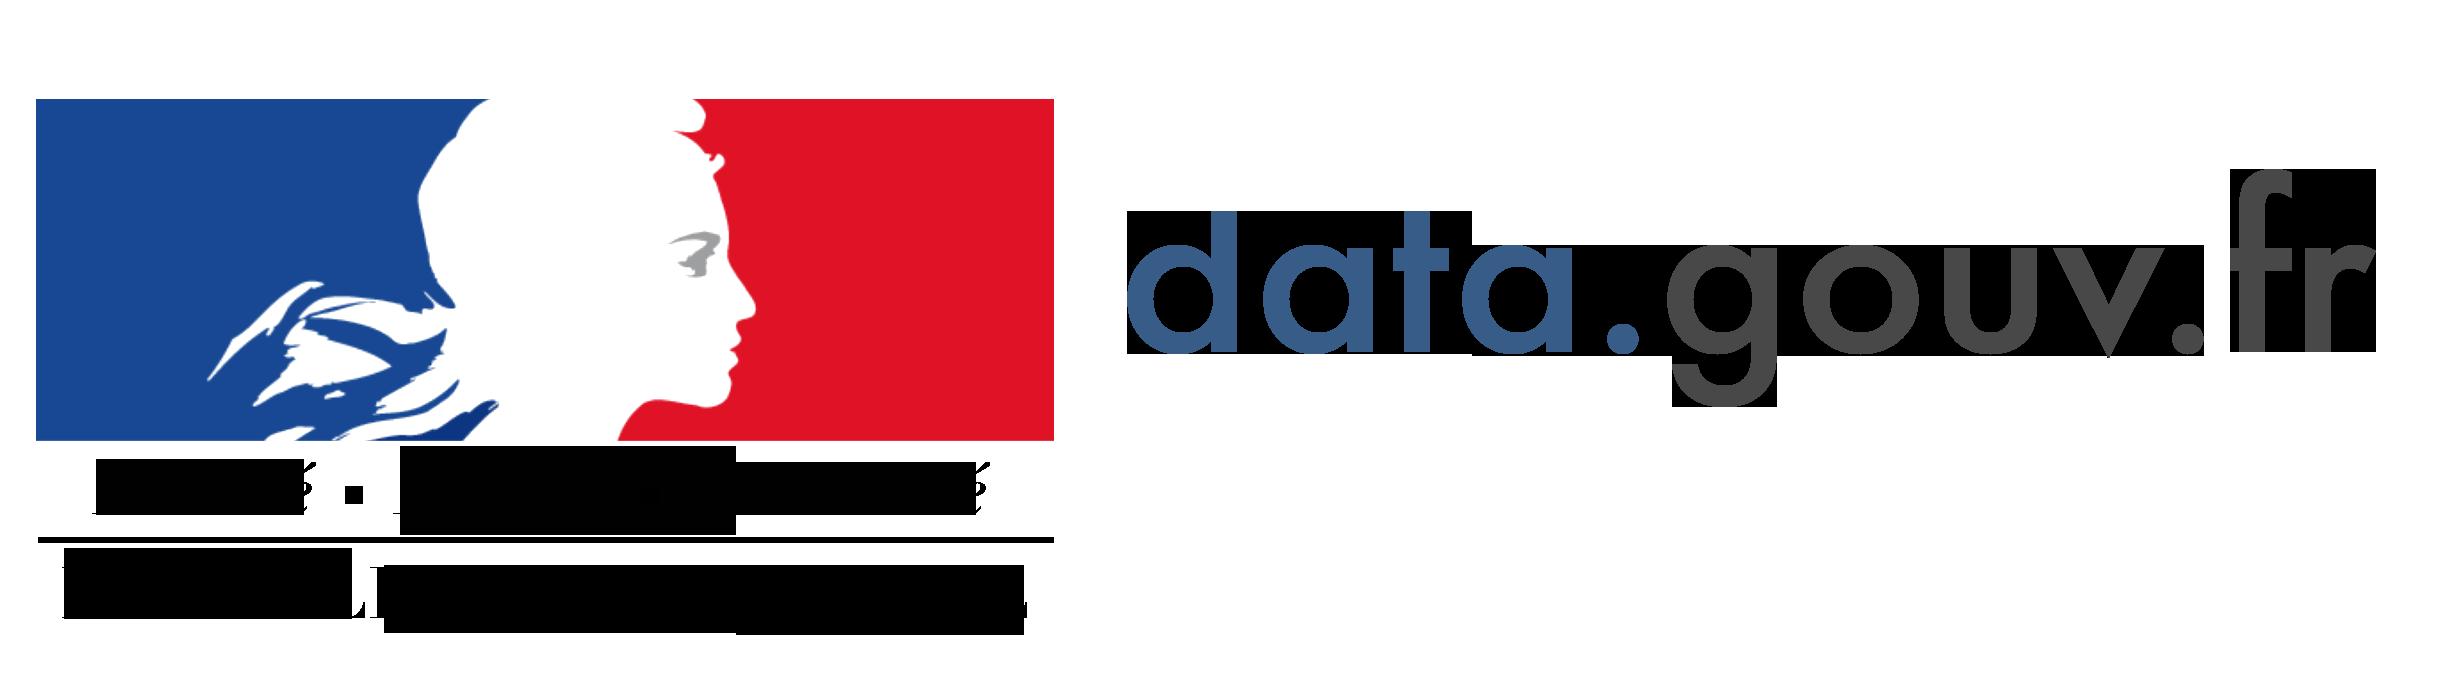 assets/images/logos/data-gouv-logo-long.png